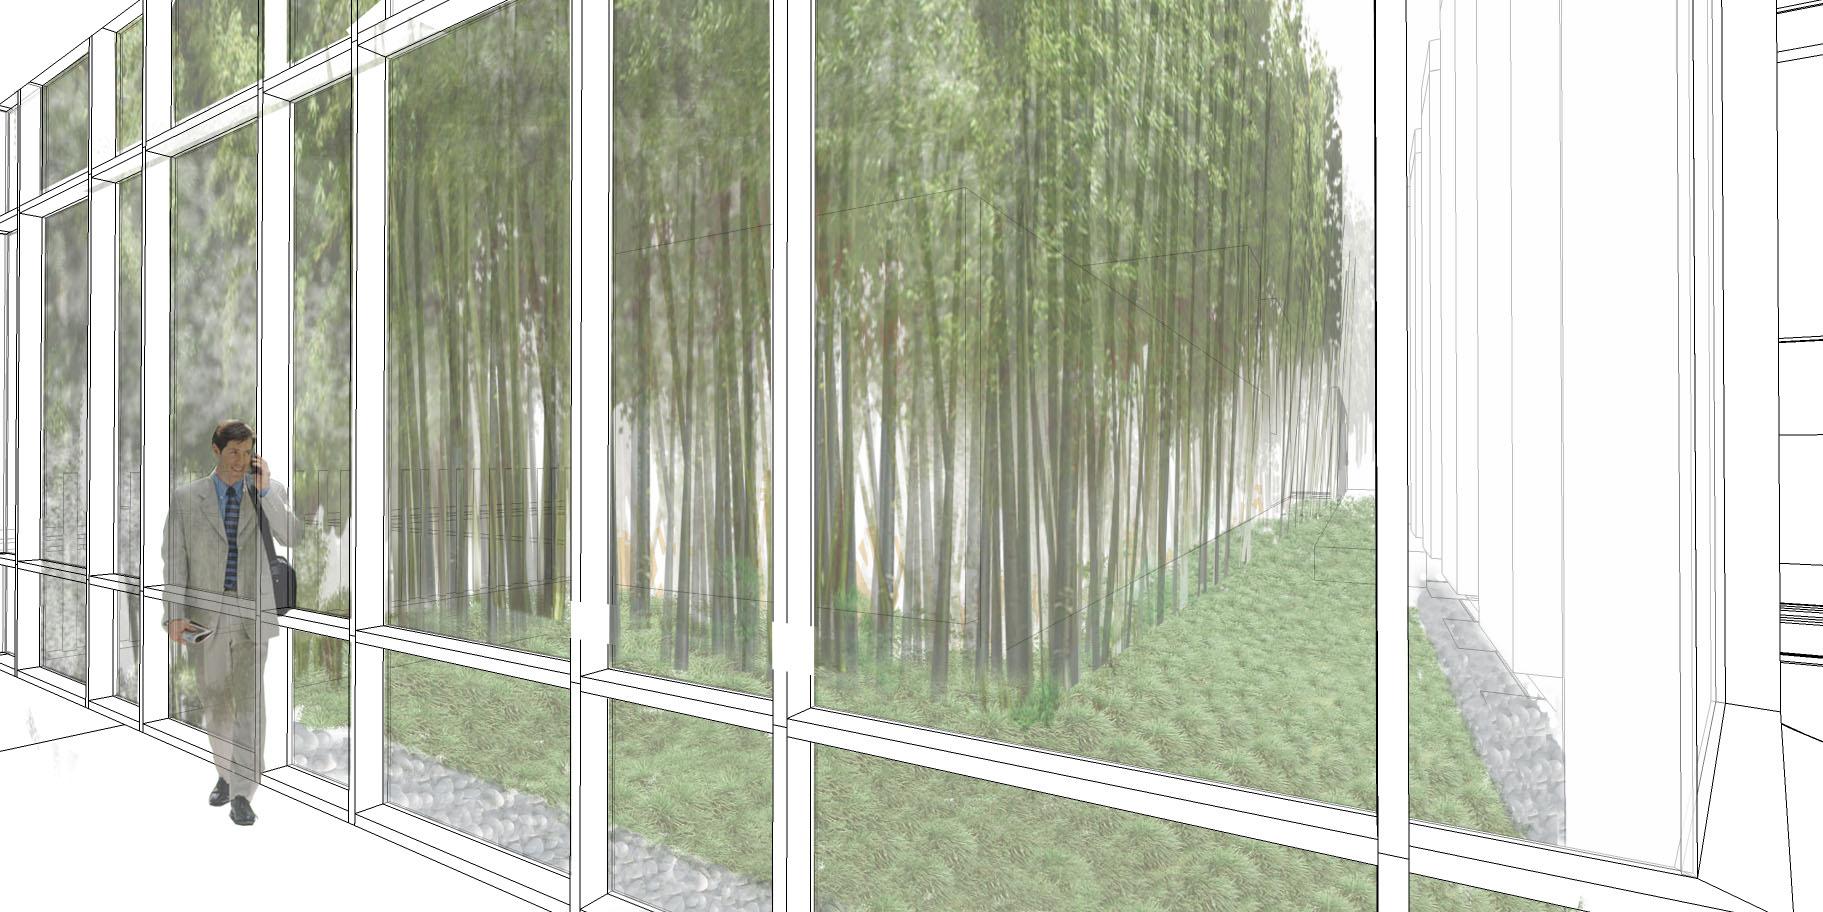 Bamboo+Garden+03012012.jpg